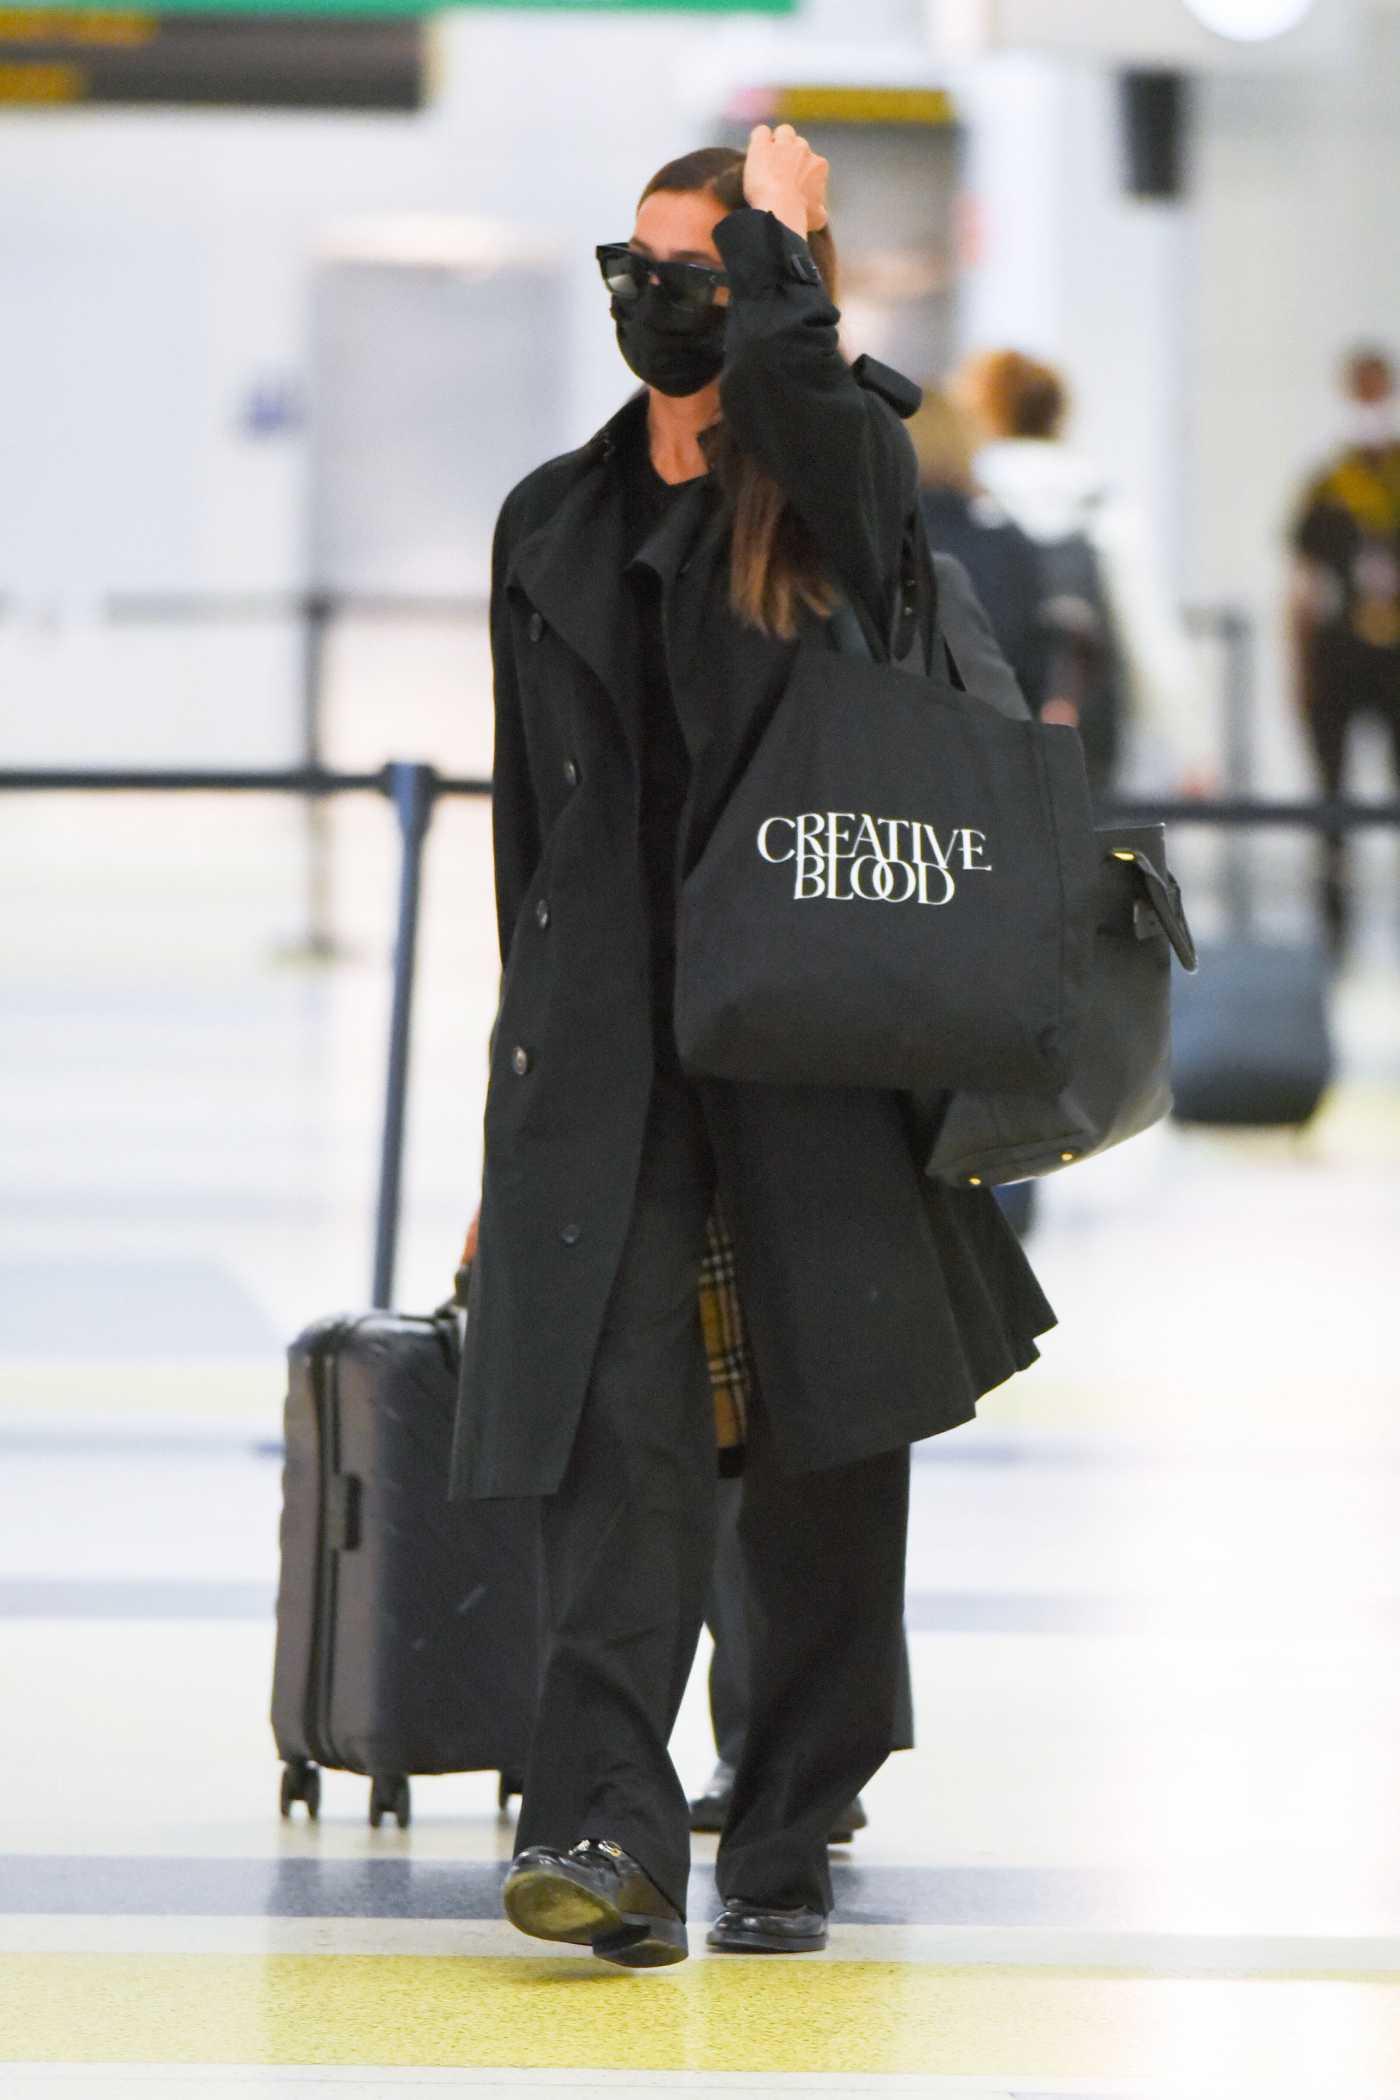 Irina Shayk in a Black Trench Coat Arrives at JFK Airport in New York 09/07/2021